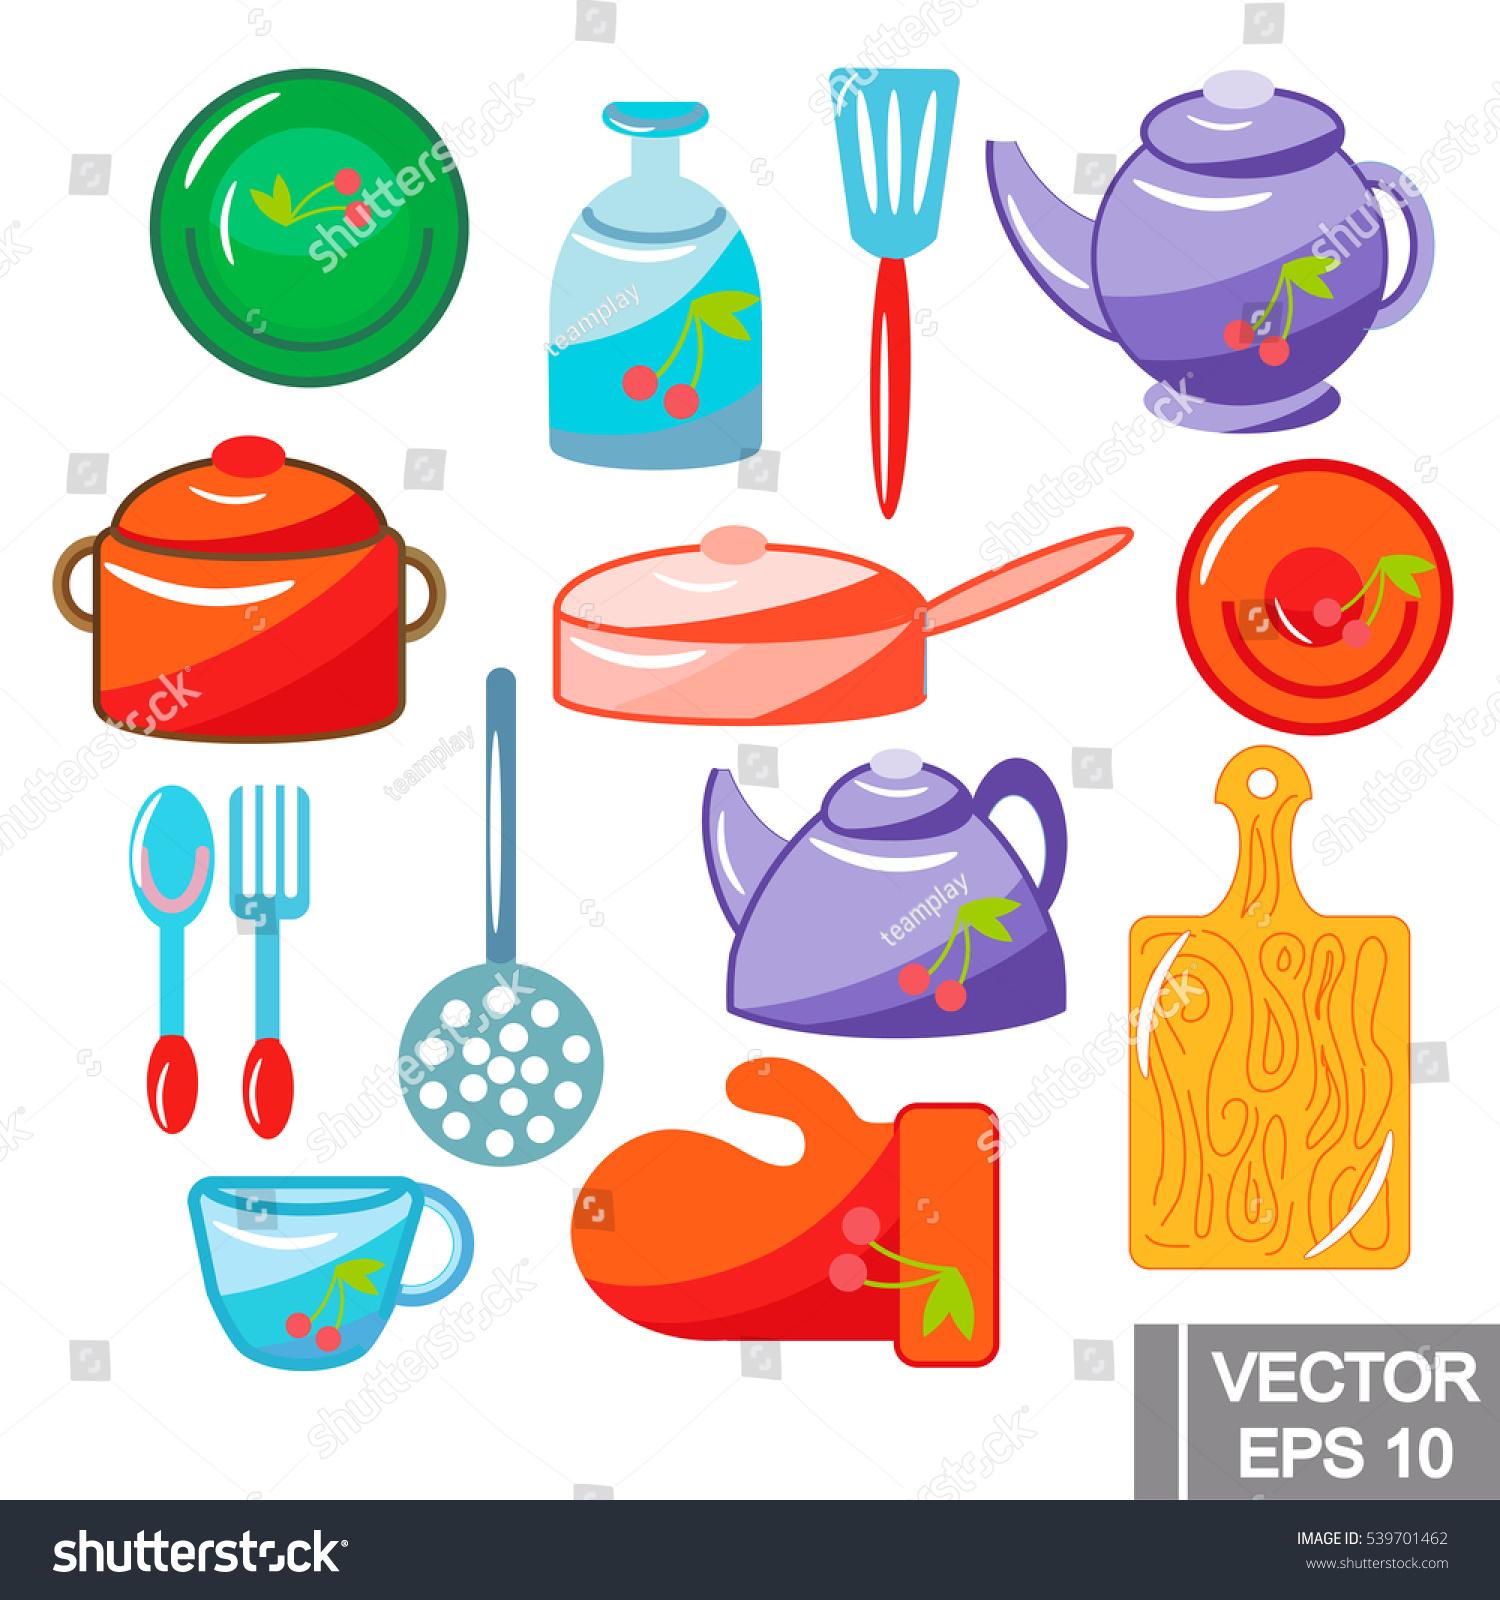 Vector kitchen set colored illustration on stock vector for Kitchen set vector